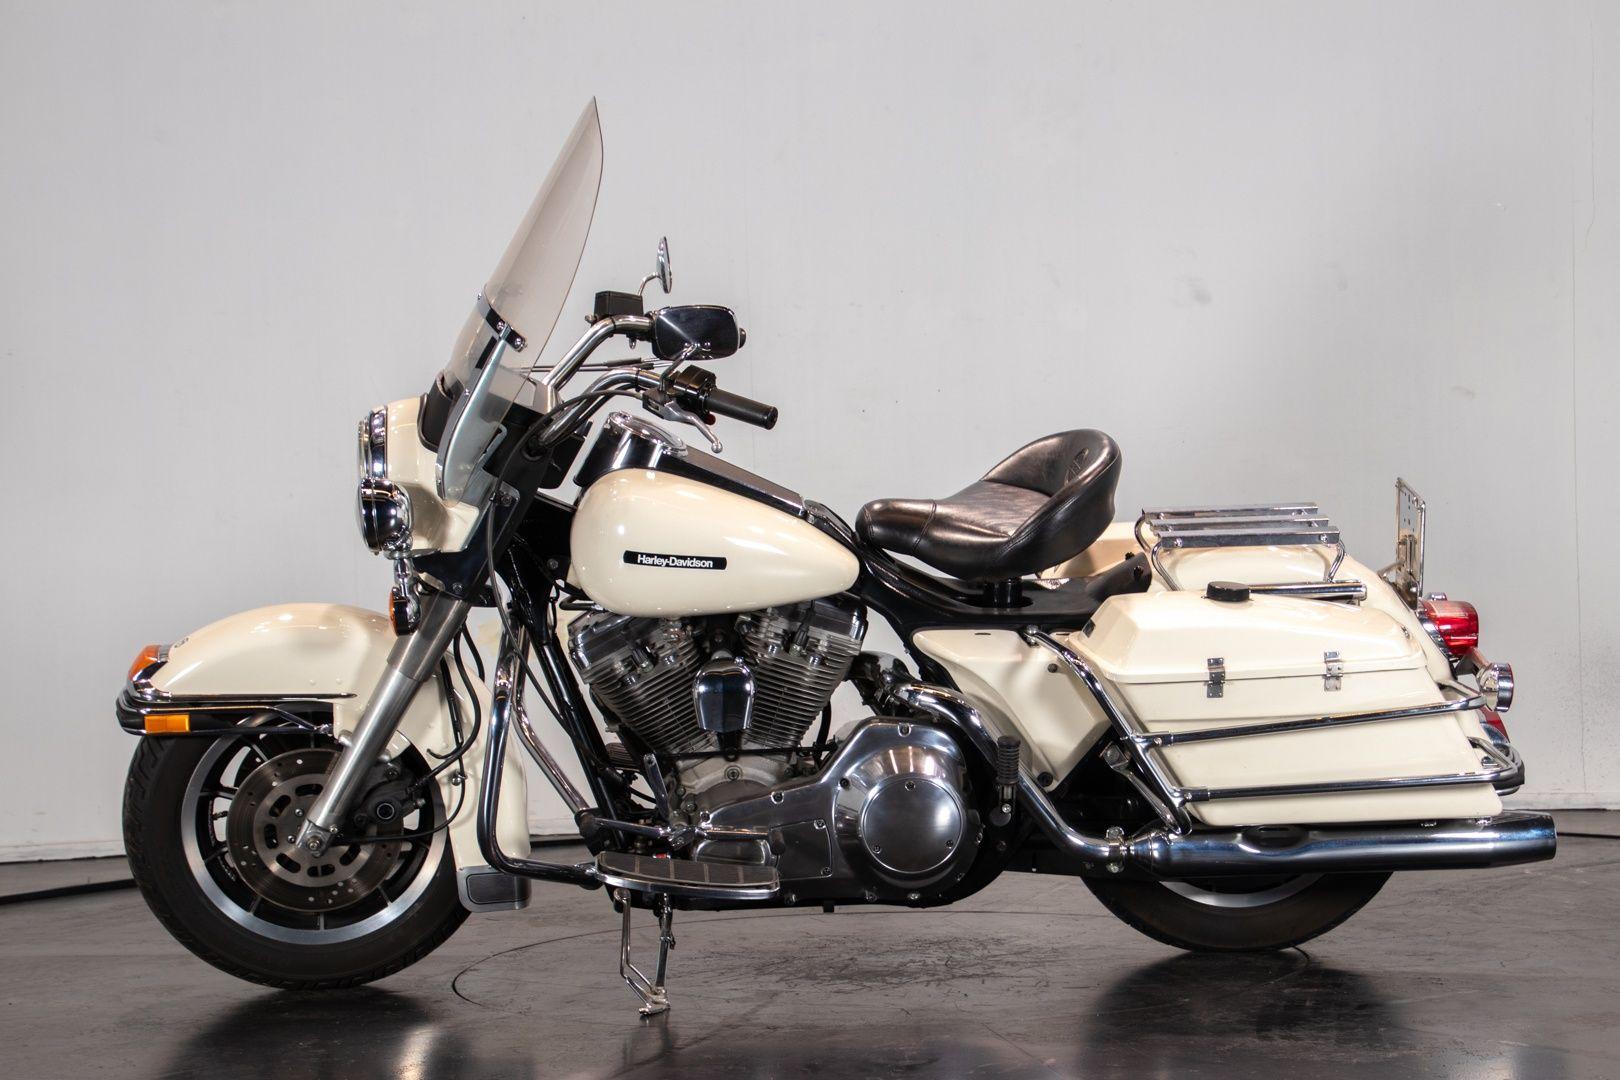 1990 Harley Davidson Flhtc Electra Glide Classic Motorrad Mofa Autos [ 1080 x 1620 Pixel ]